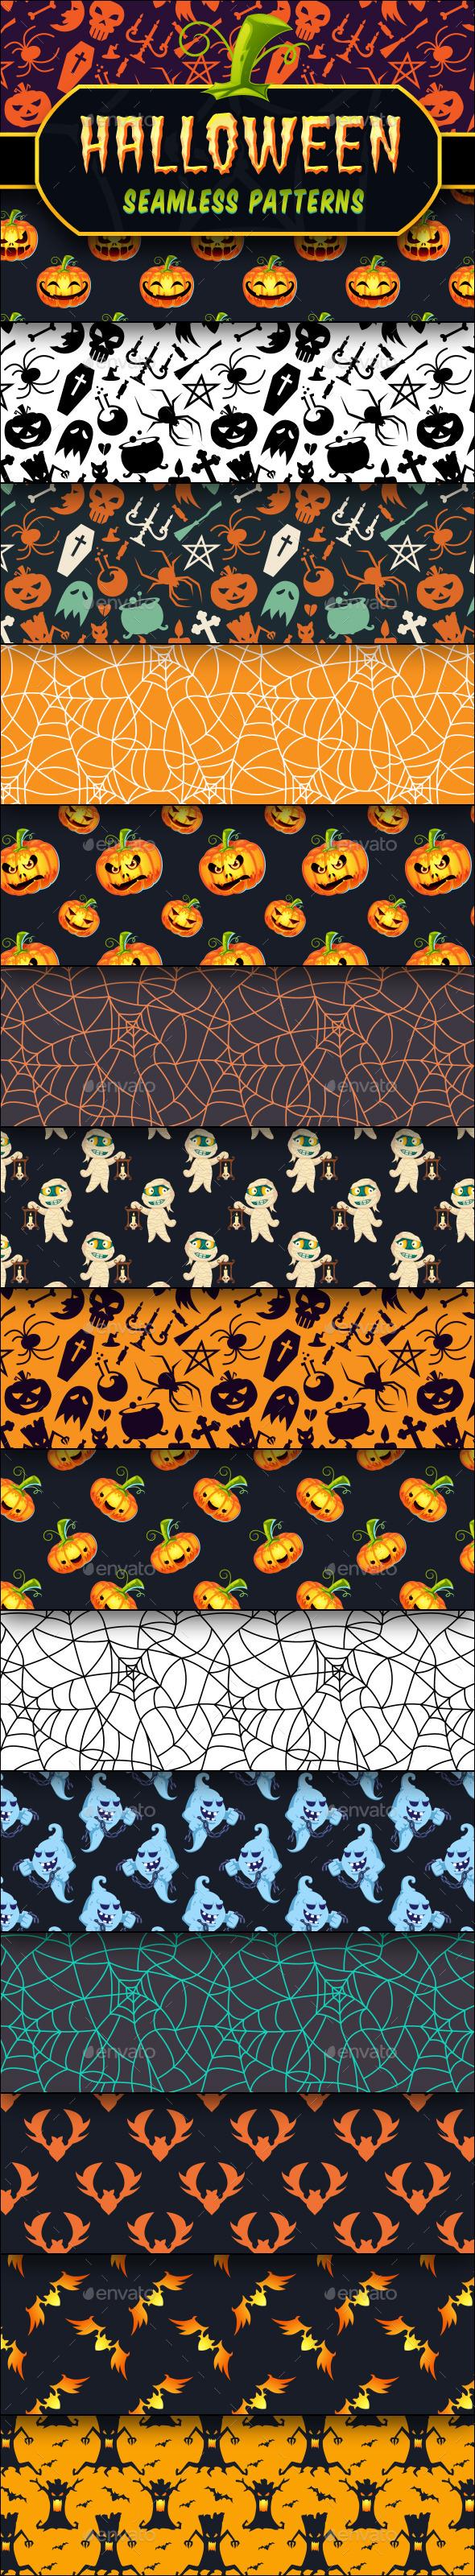 Halloween Seamless Patterns Set - Halloween Seasons/Holidays